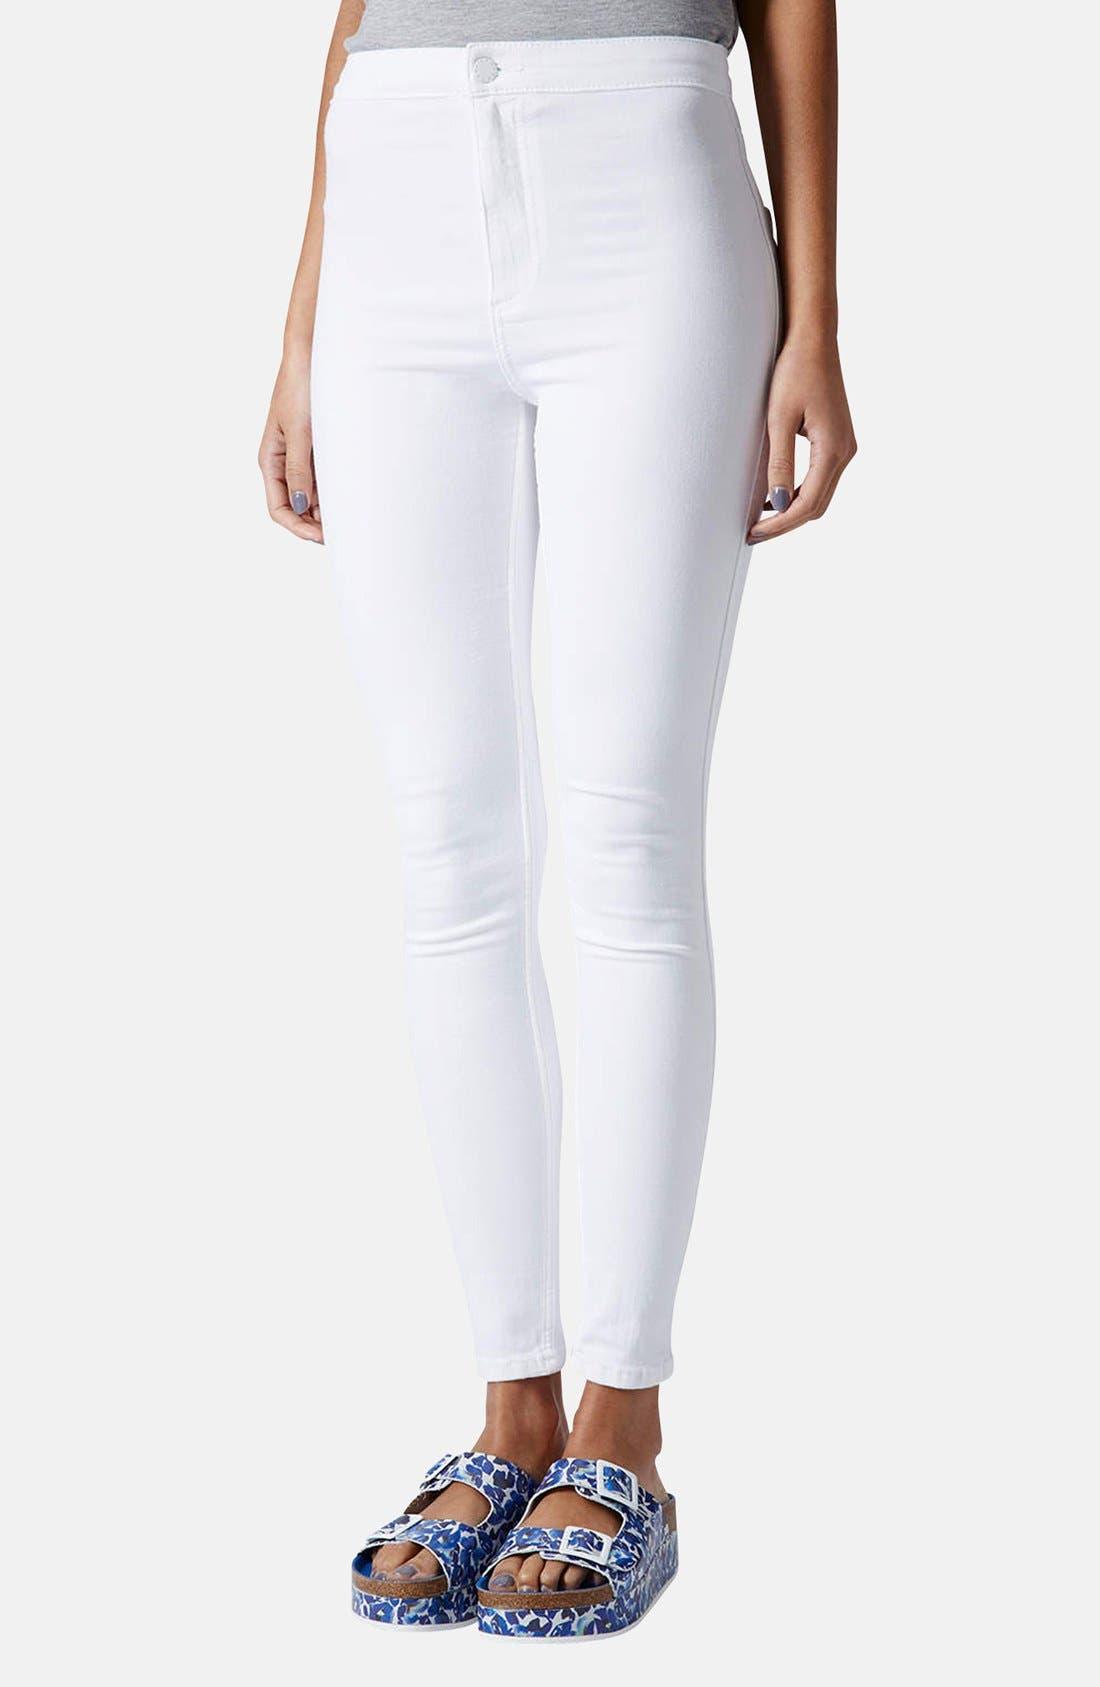 Main Image - Topshop Moto 'Joni' High Rise Skinny Jeans (Regular & Long)